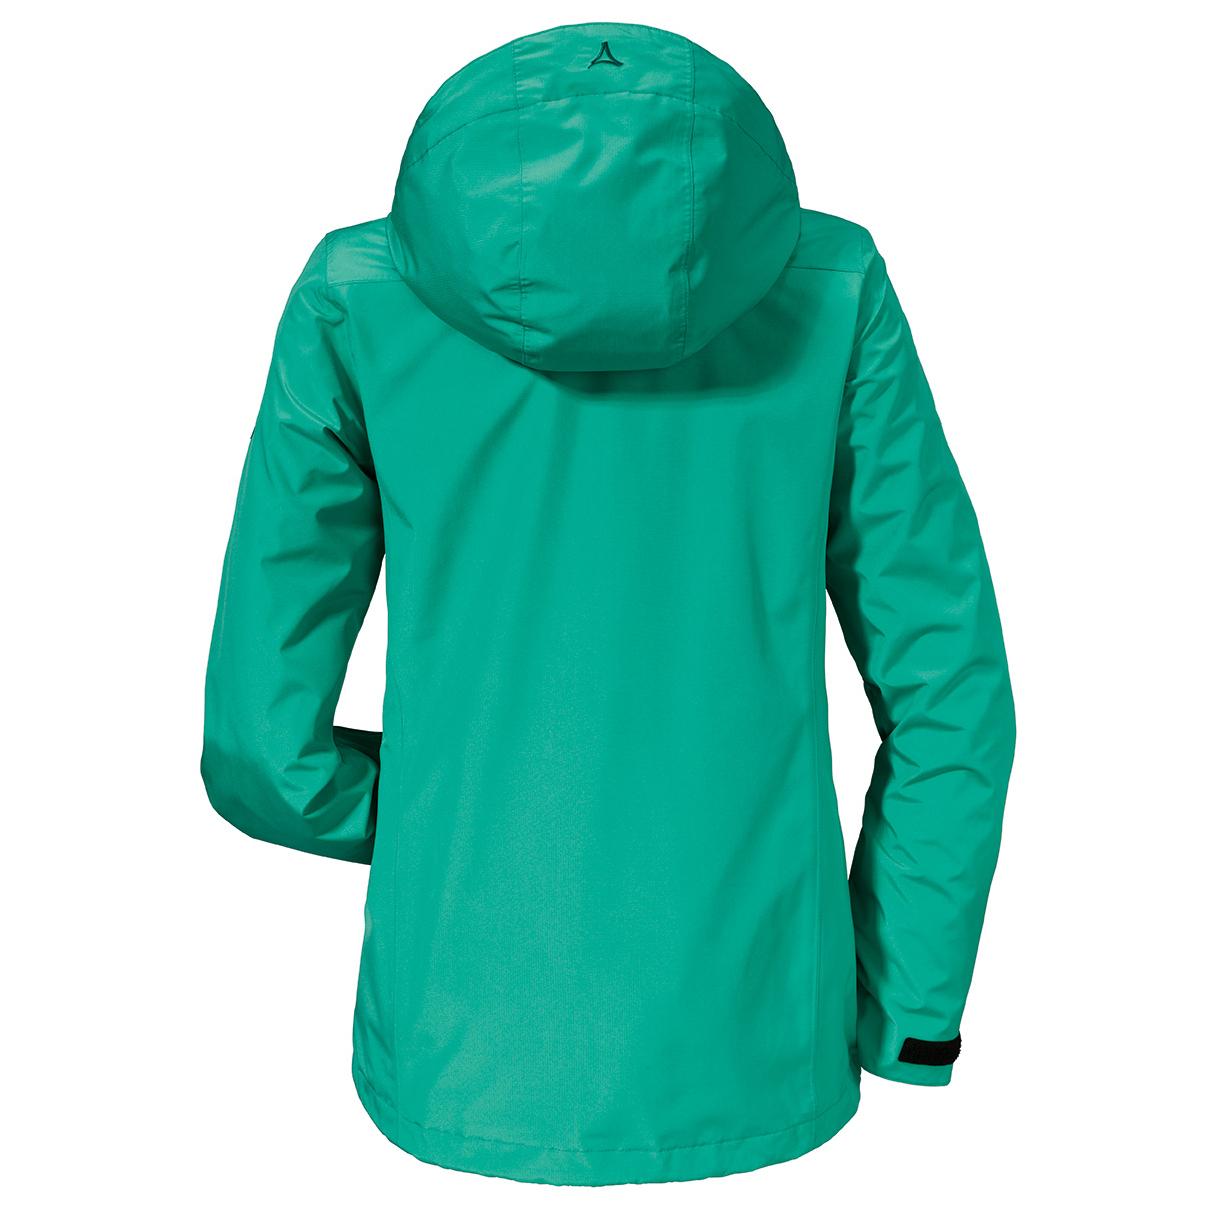 Sch/öffel Damen Jacket Sevilla2 Jacken